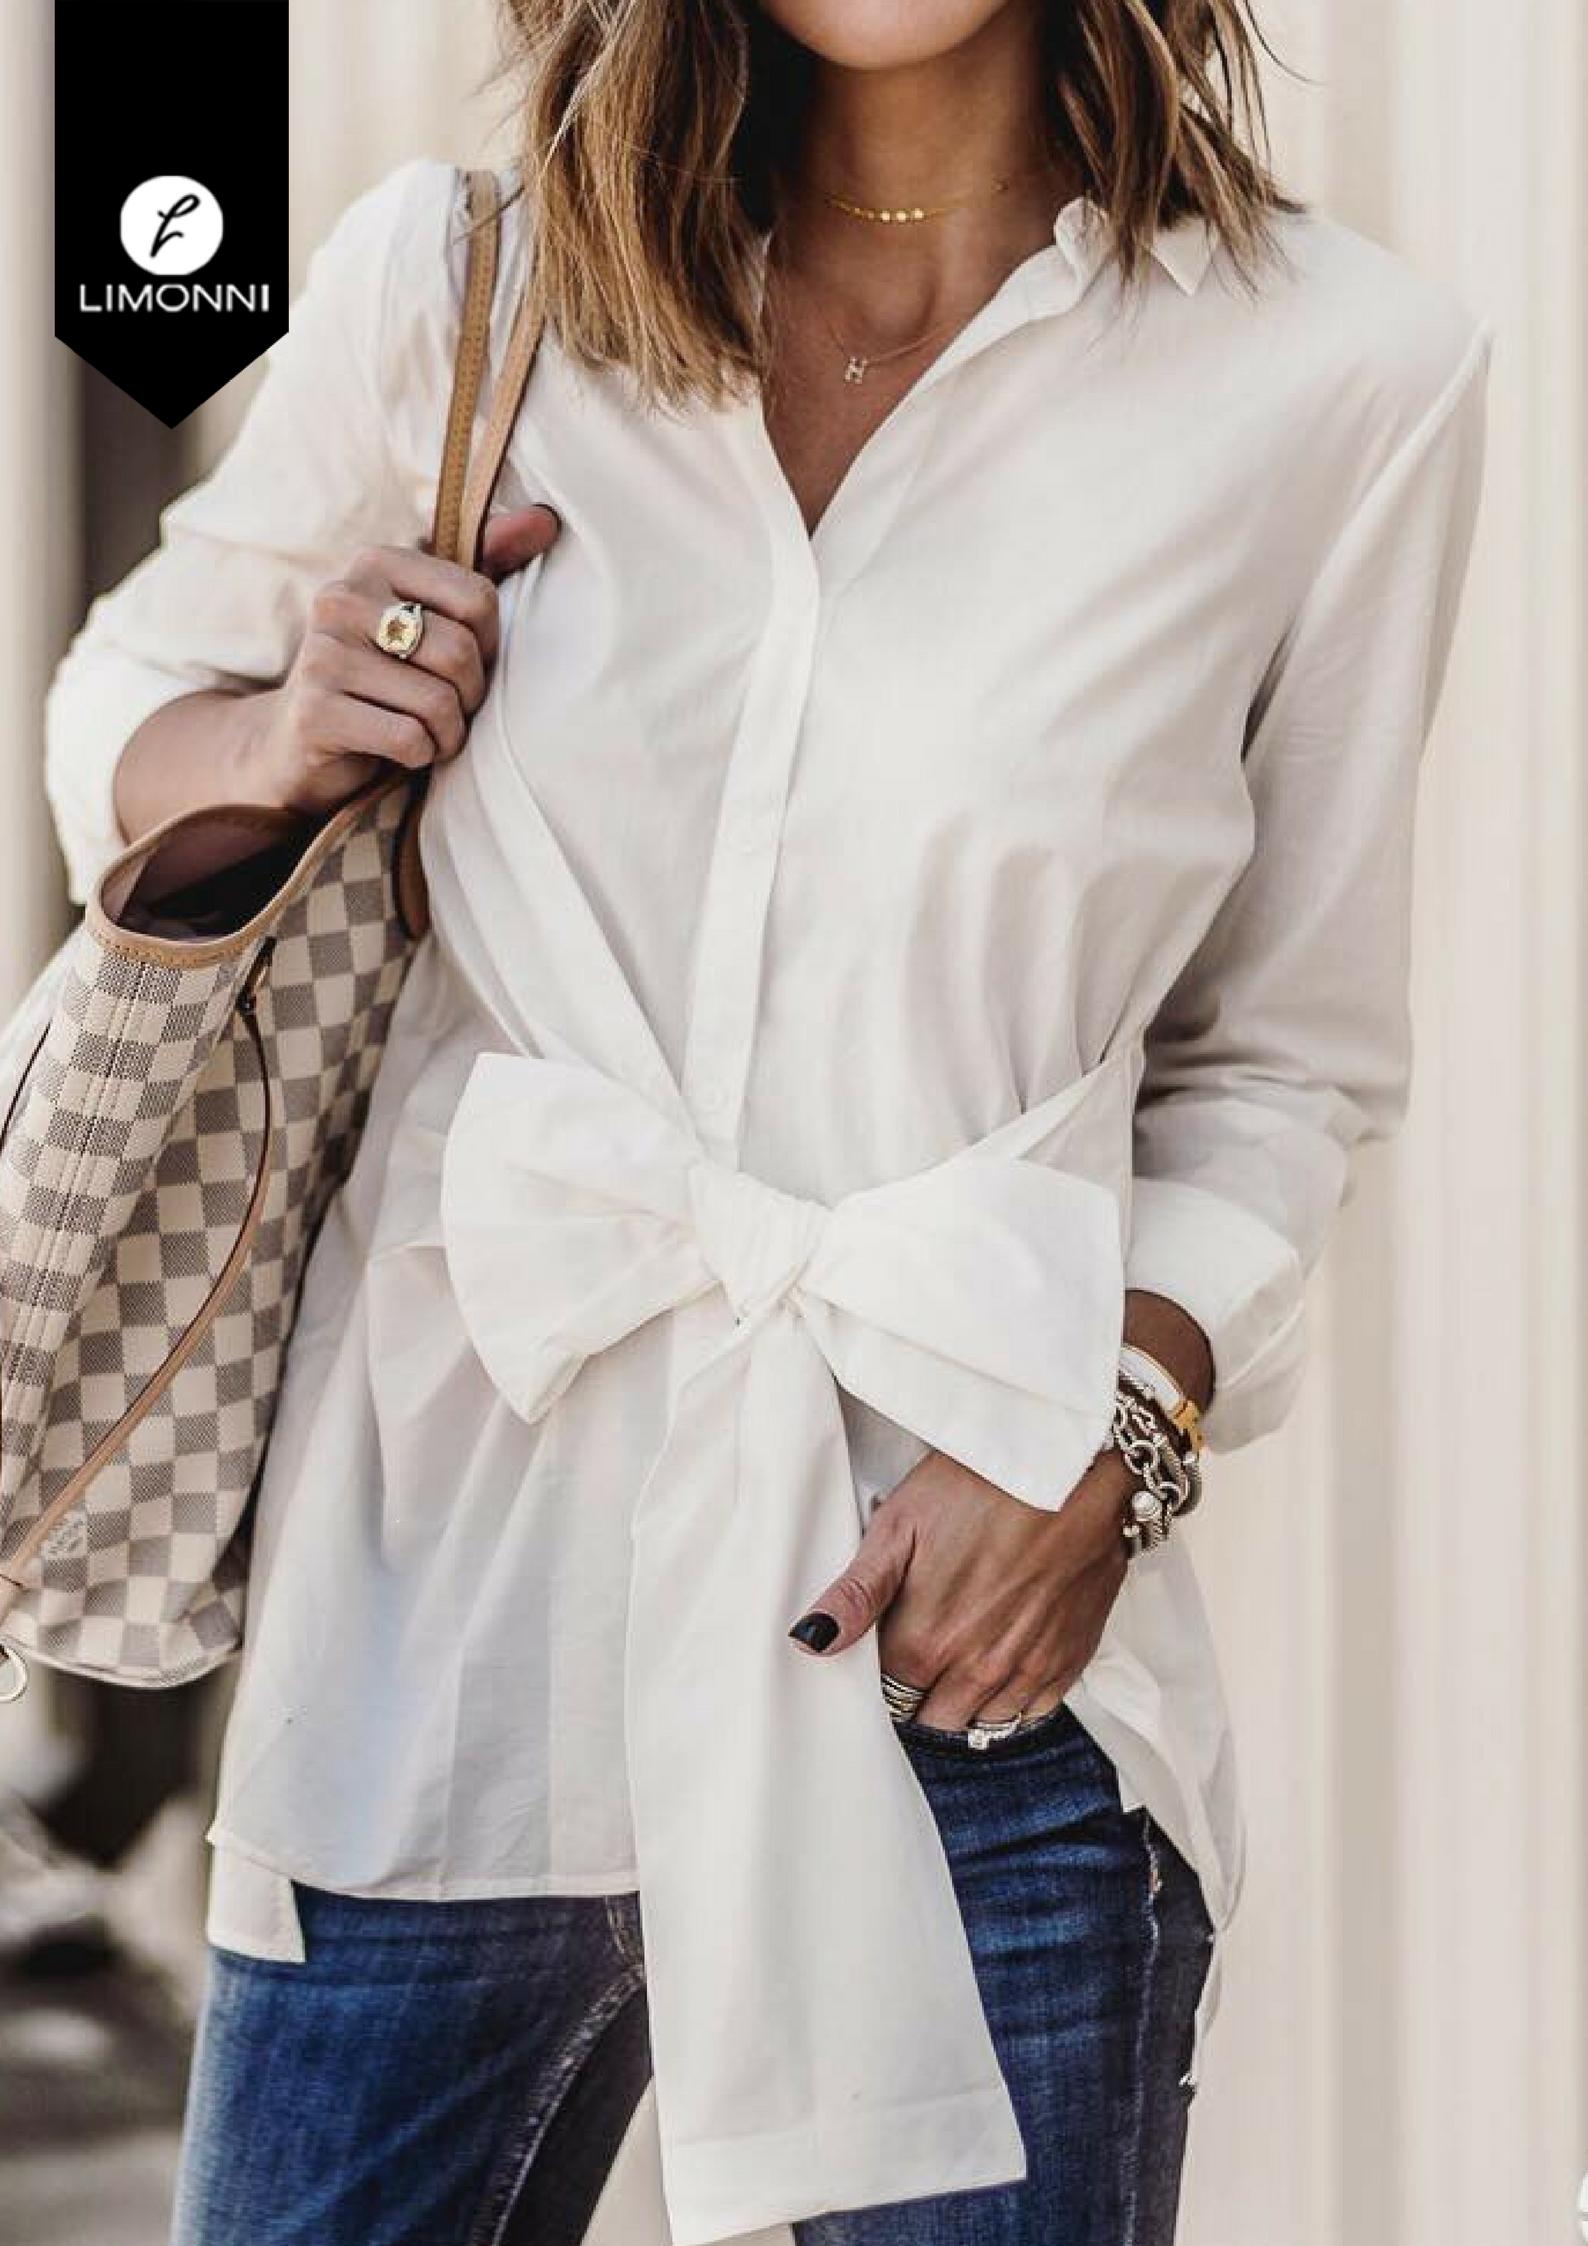 Blusas para mujer Limonni Bennett LI1295 Casuales